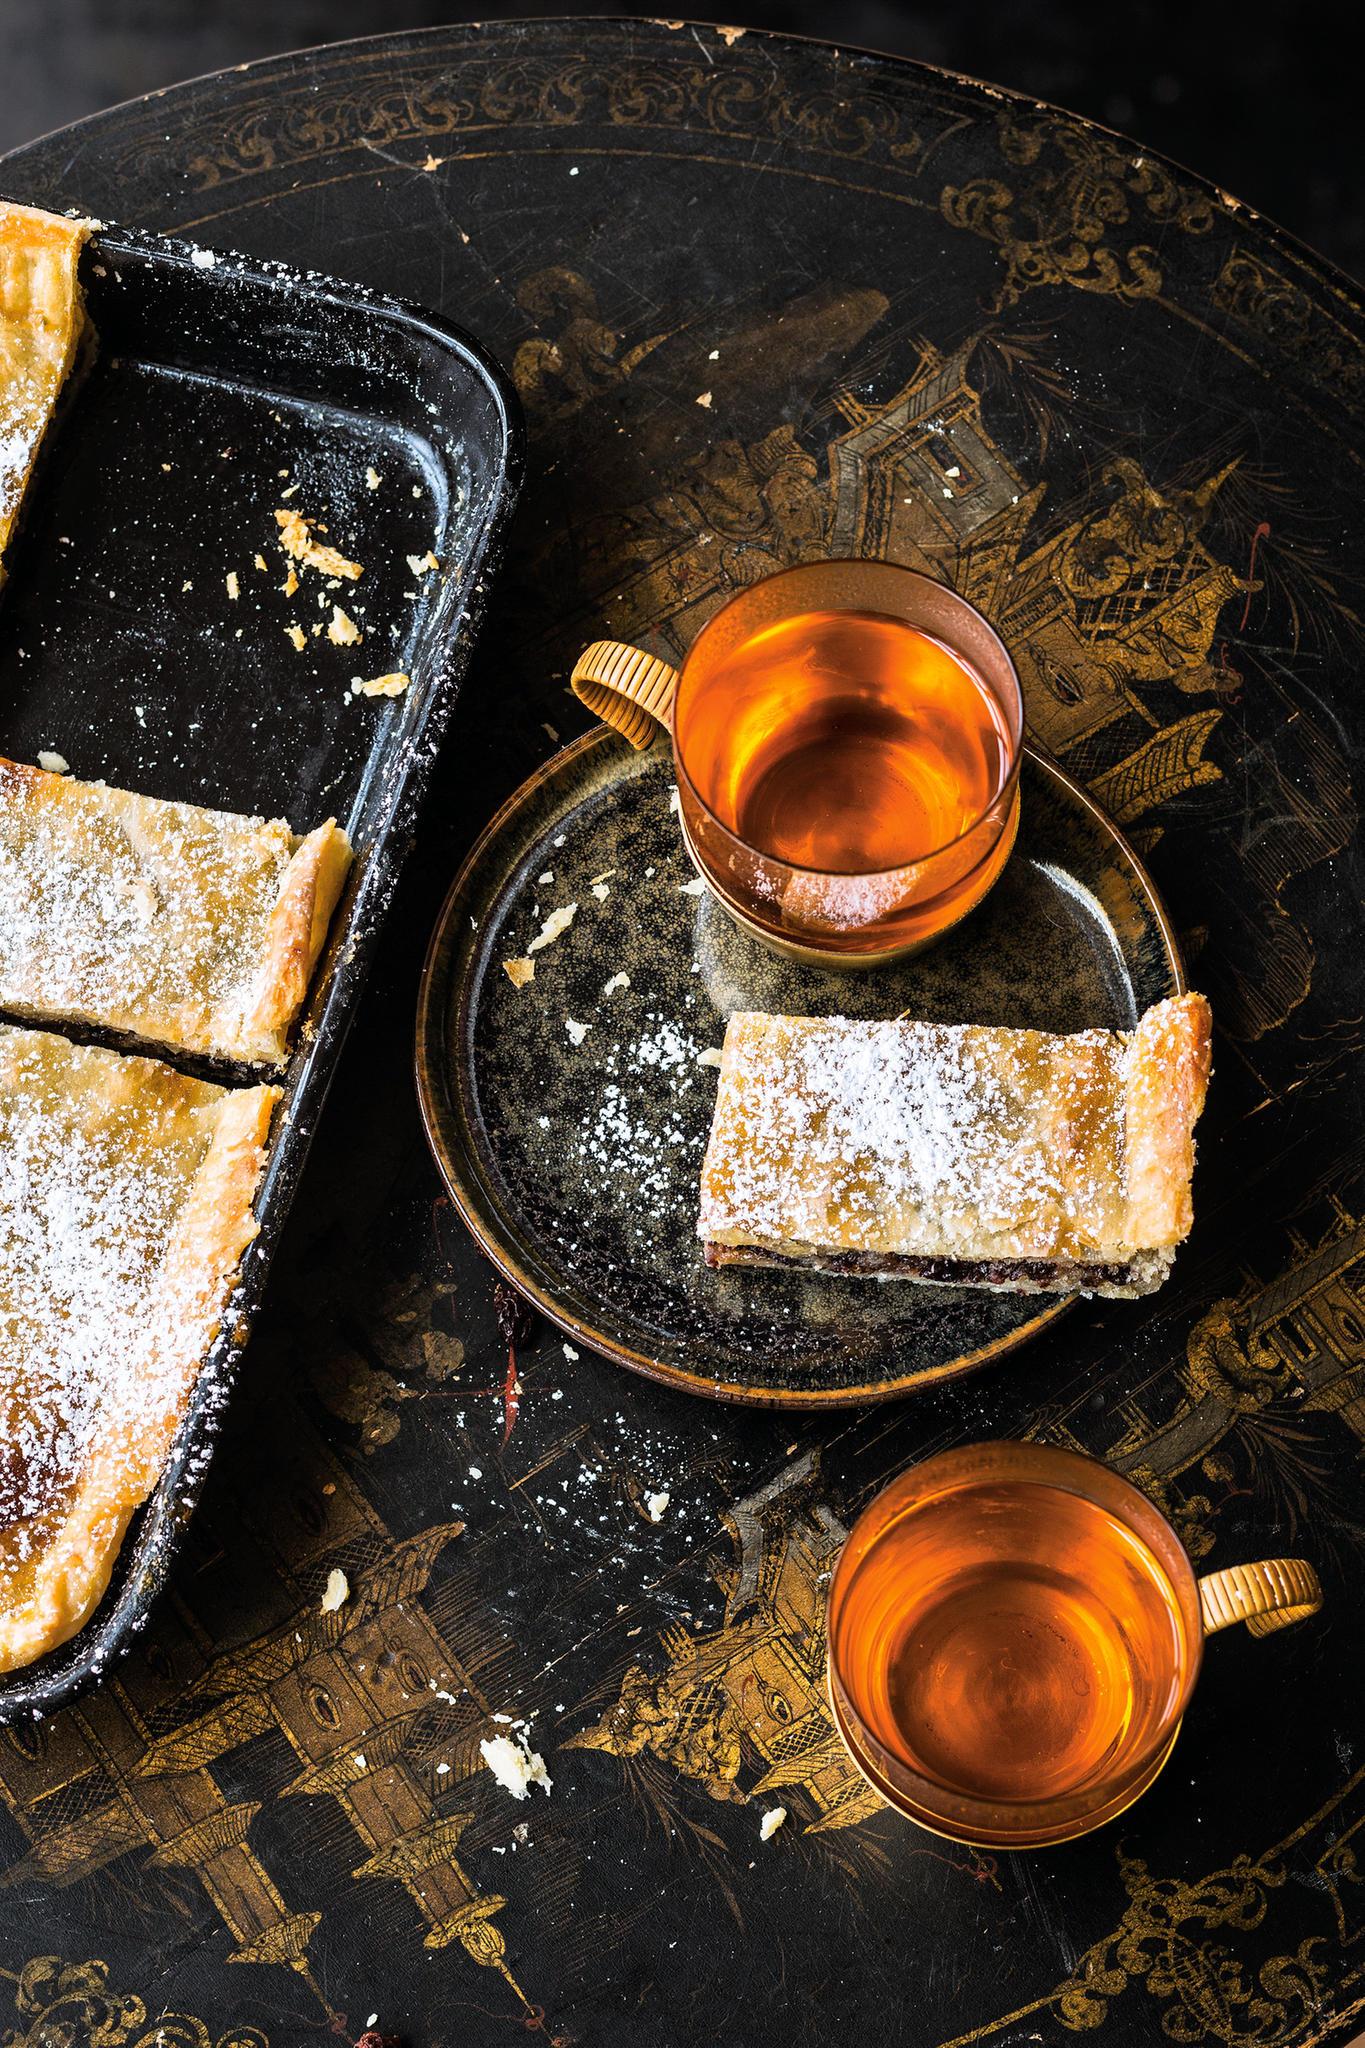 Der perfekte Kuchen zum Tee - Rezept zum Nachkochen | STERN.de